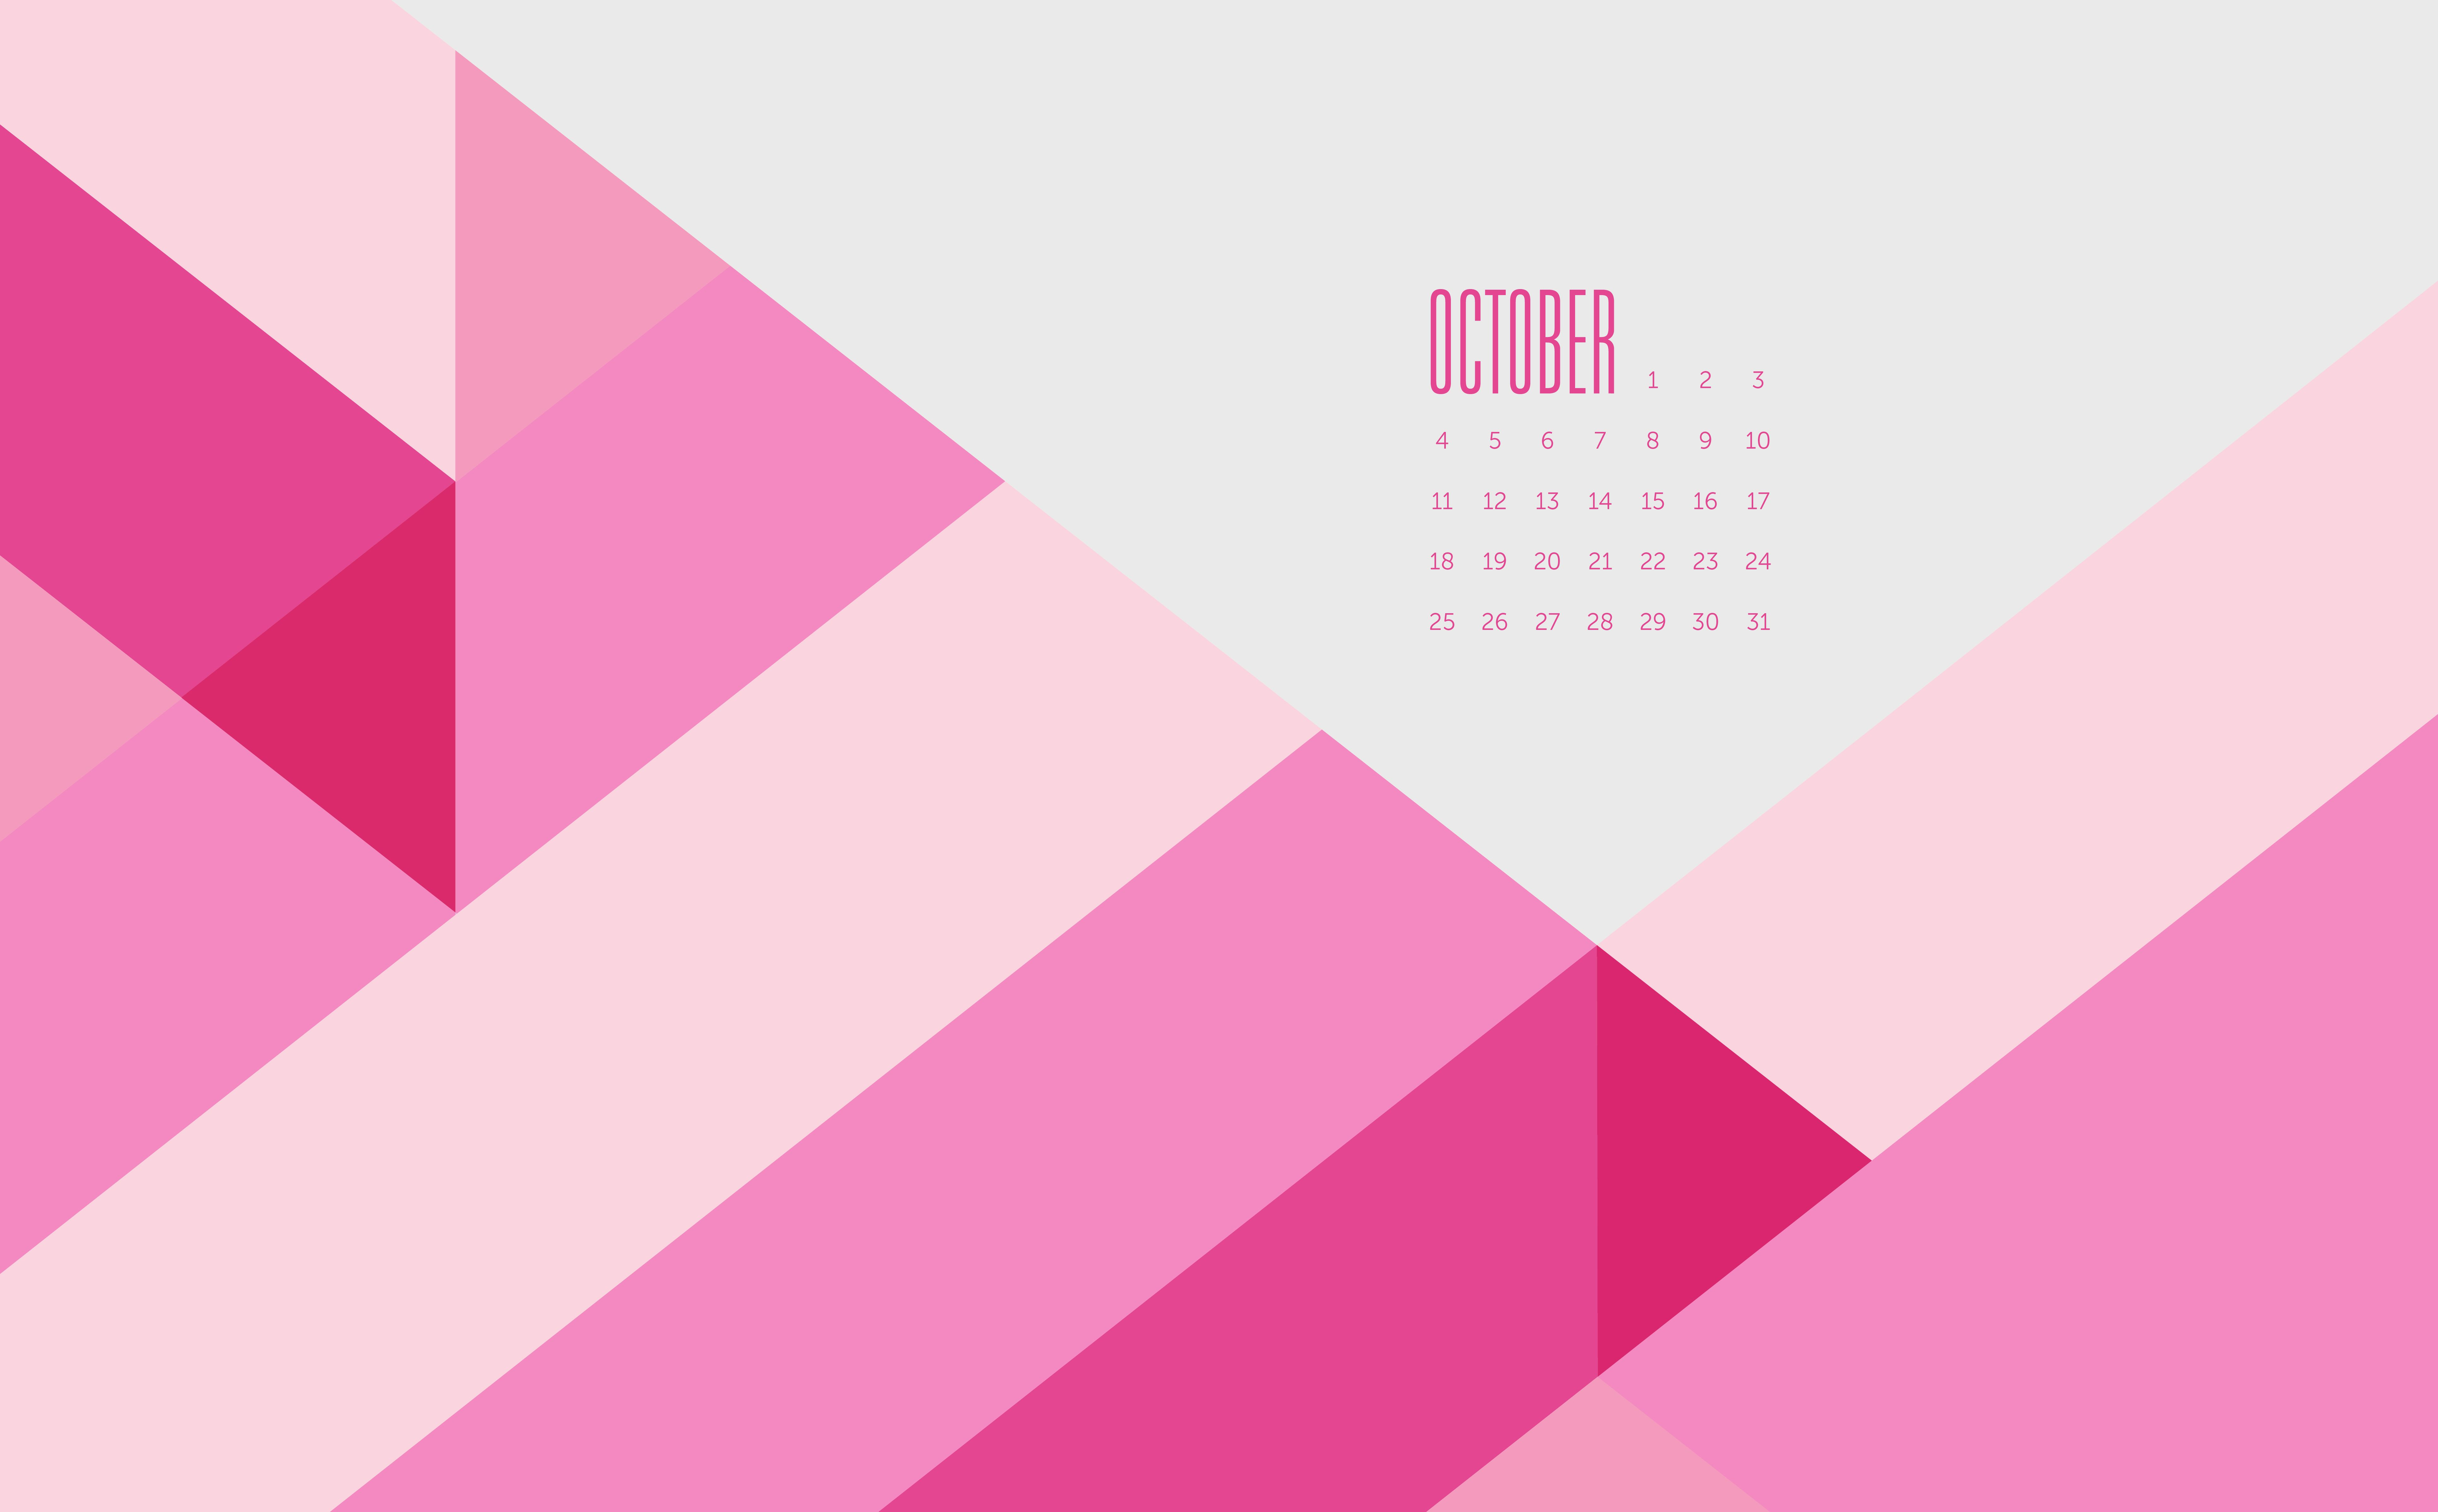 October Color Block Bca Wallpapers May Designs October Colors Wallpaper Downloads 2015 Wallpaper